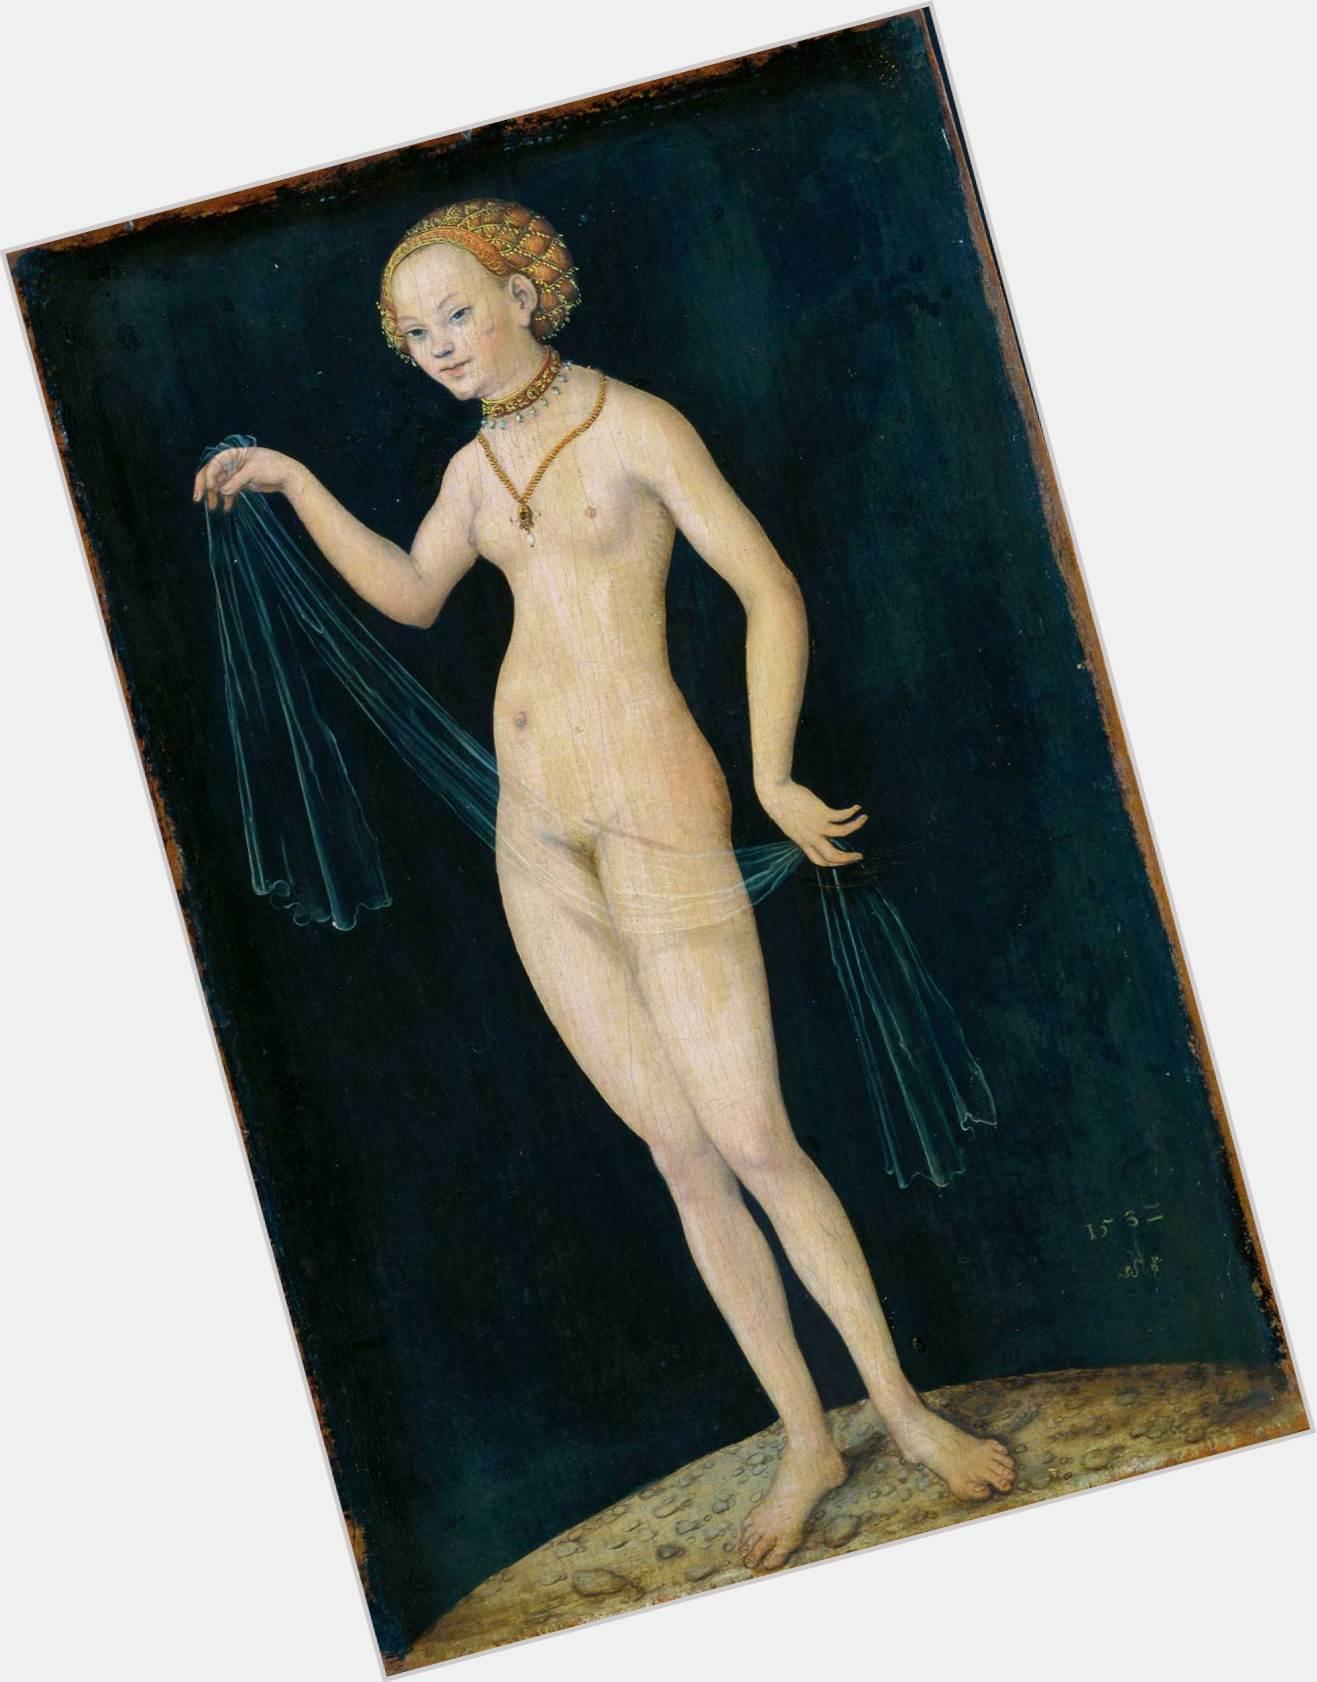 "<a href=""/hot-men/lucas-cranach/where-dating-news-photos"">Lucas Cranach</a>"